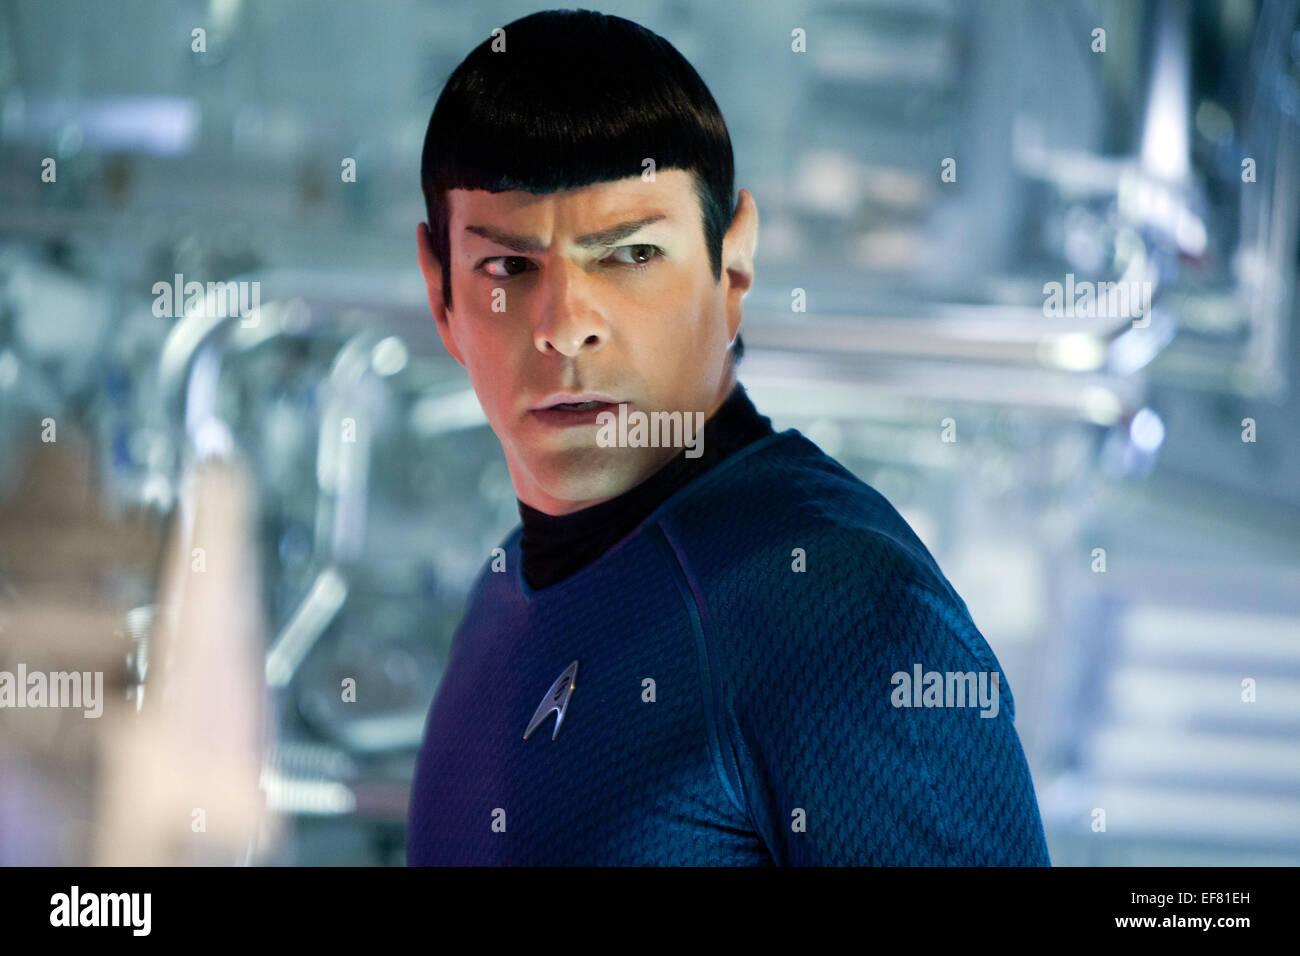 ZACHARY QUINTO STAR TREK INTO DARKNESS (2013) - Stock Image